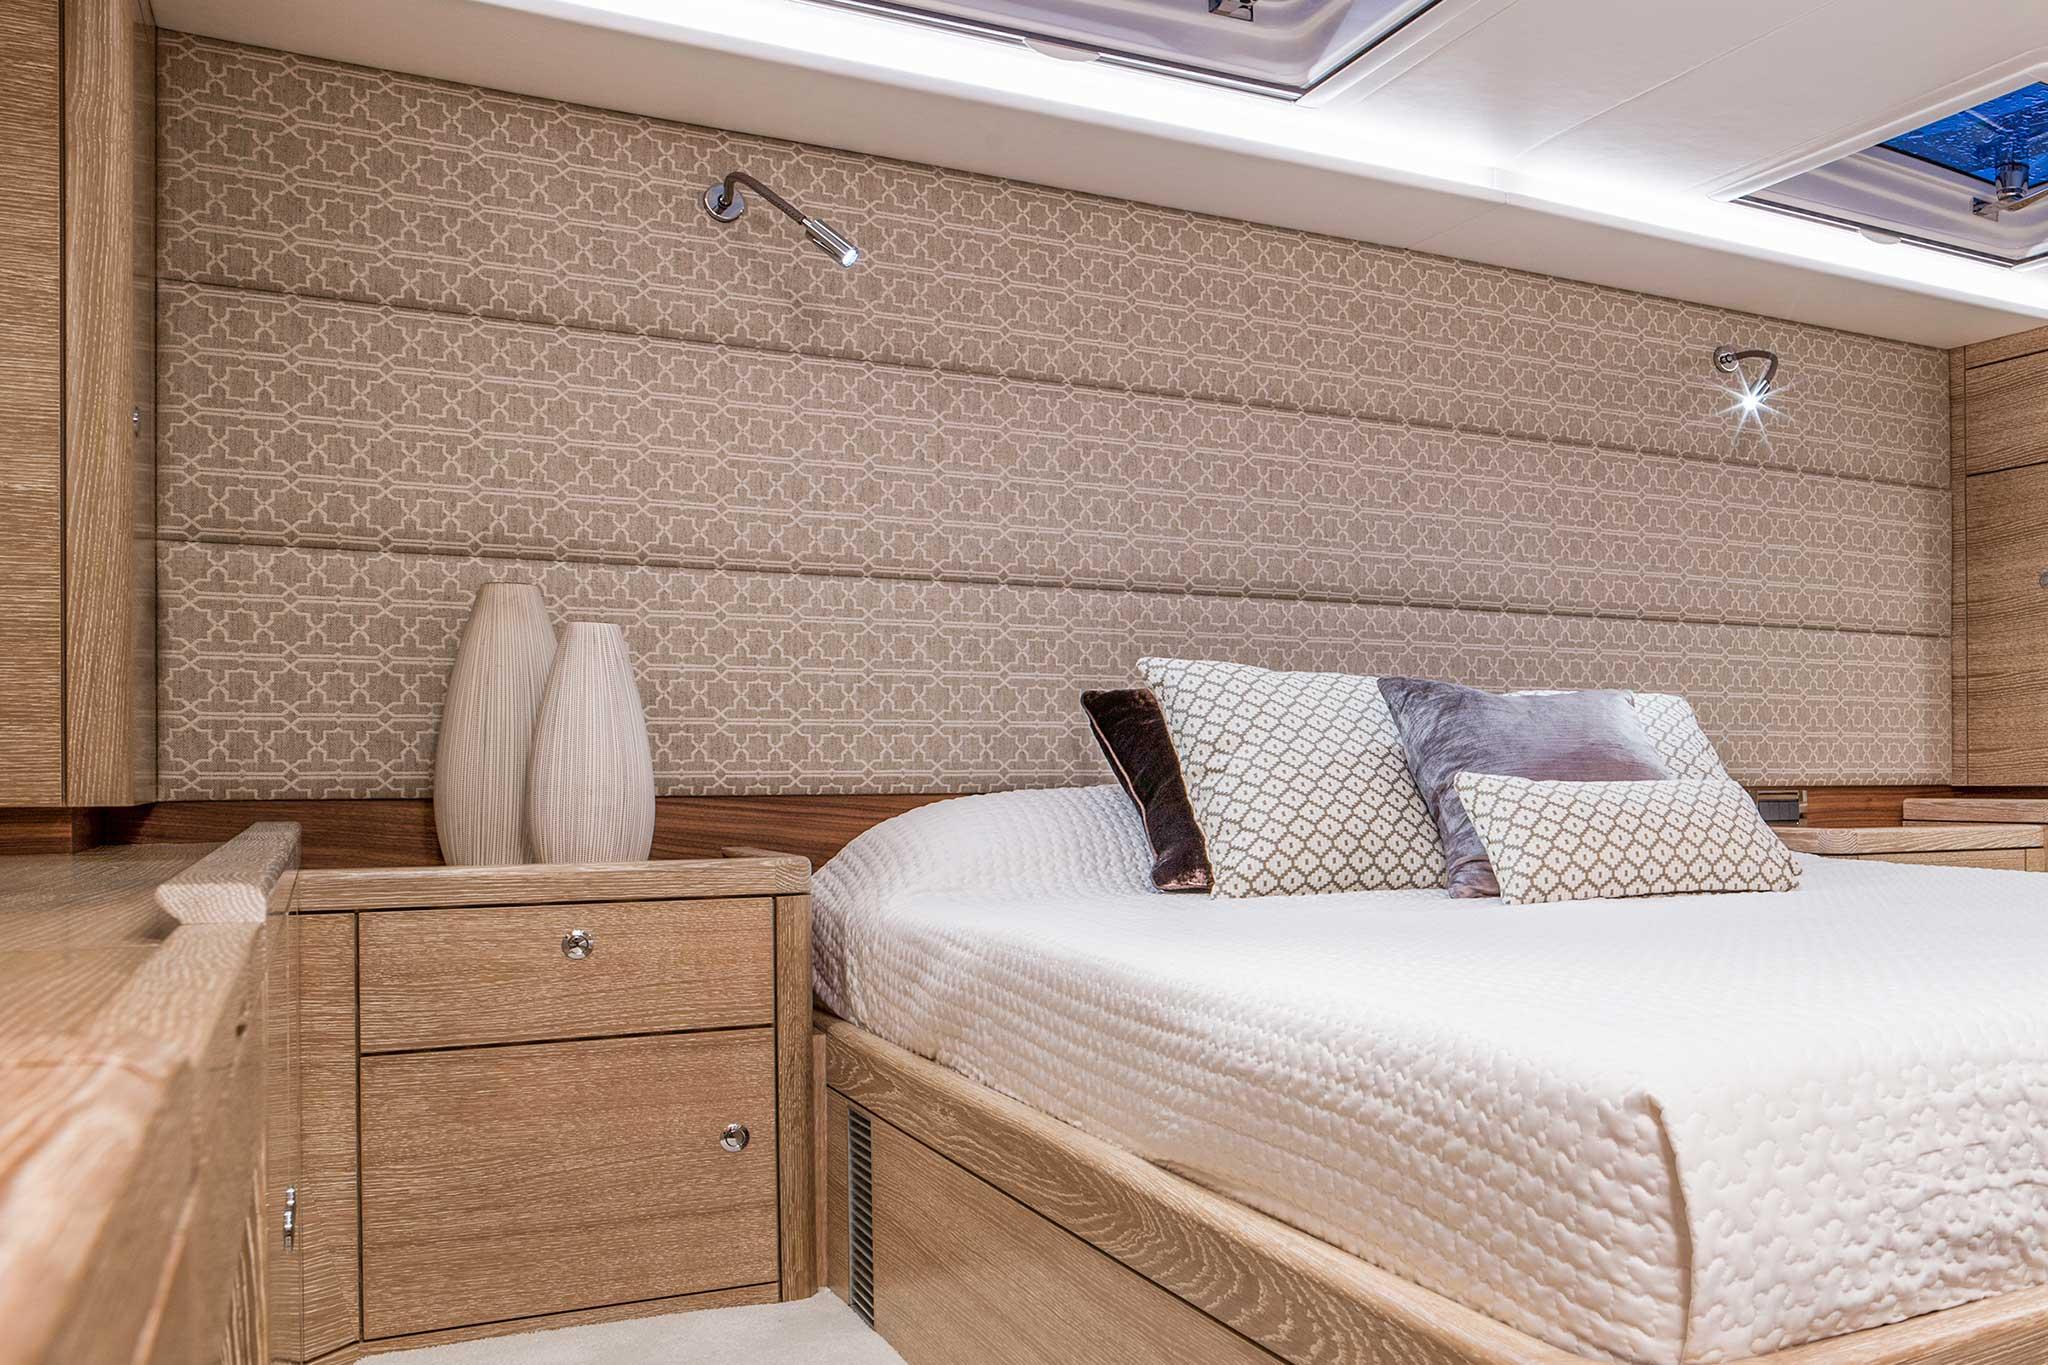 Fabric Headboard Onboard A Yacht